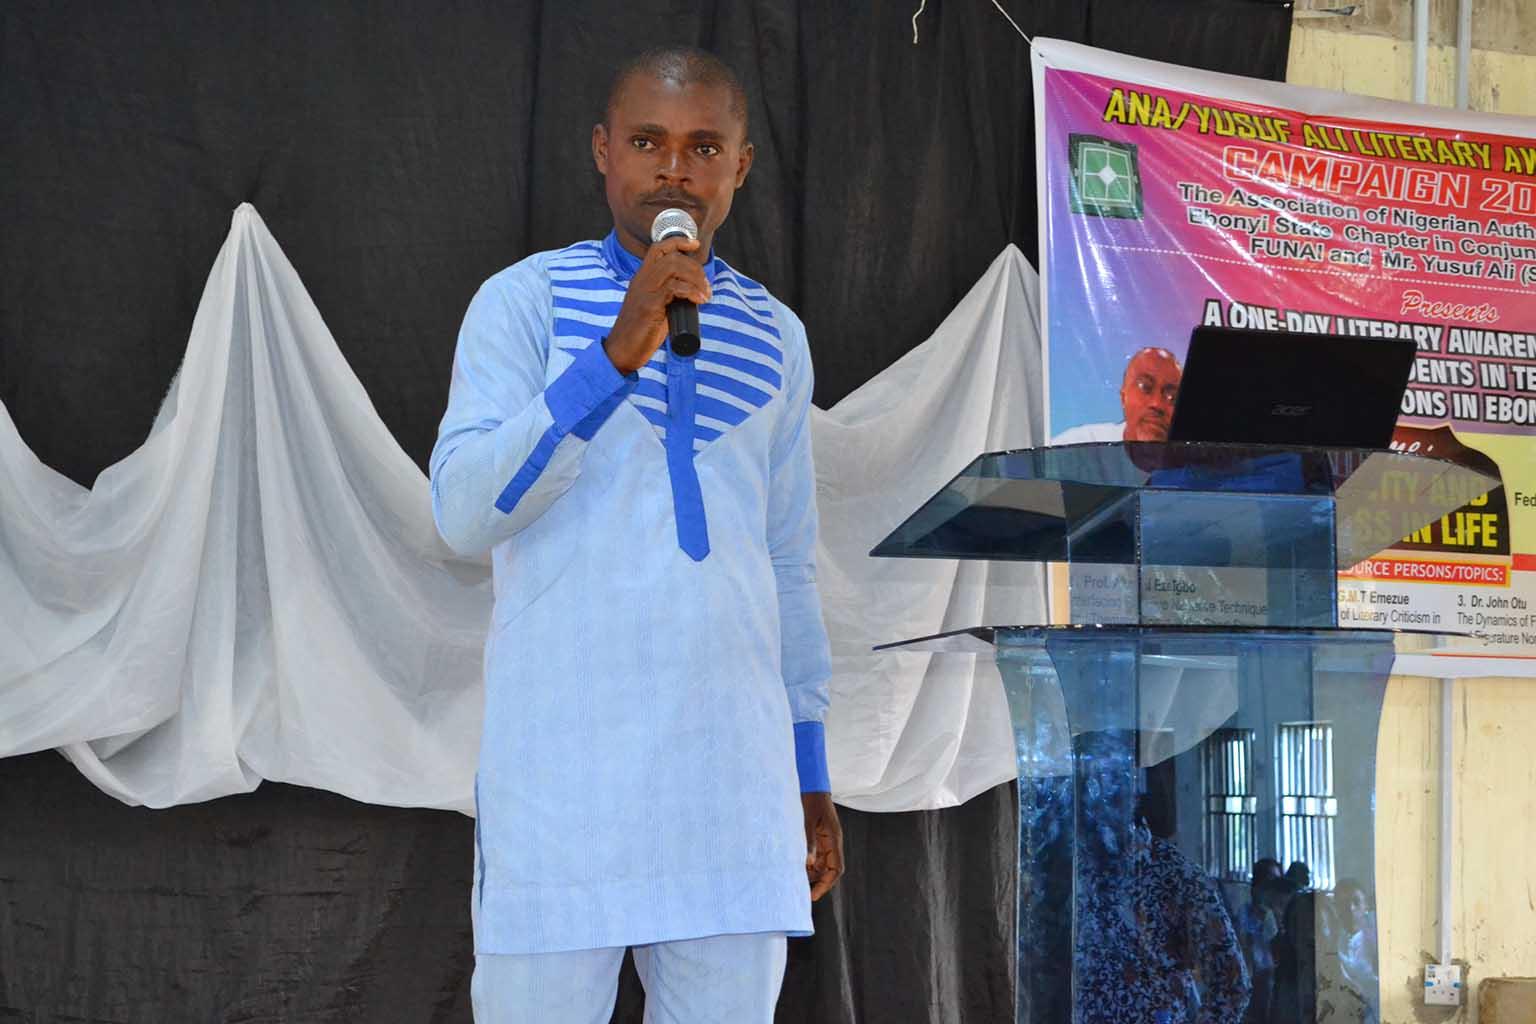 Dr Onyebuchi Nwosu making his presentation at the event.